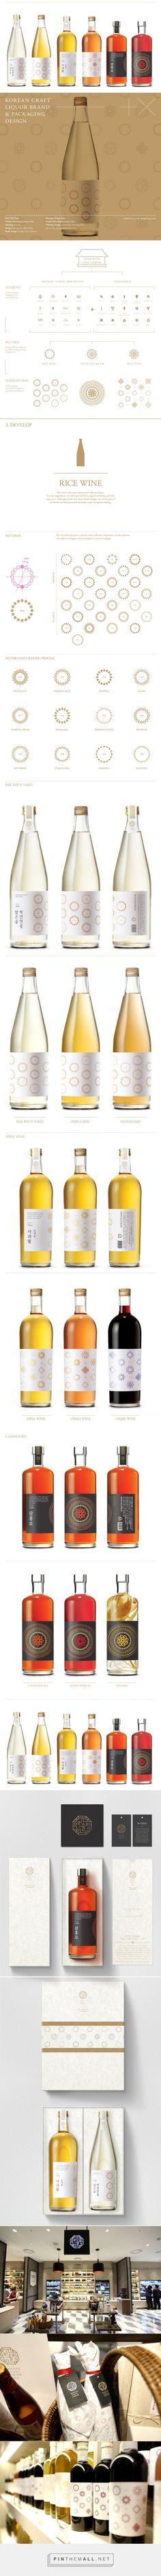 Shinsegae Traditional Liquor by Plus X BX Design Team & Shinsaegae Design Team